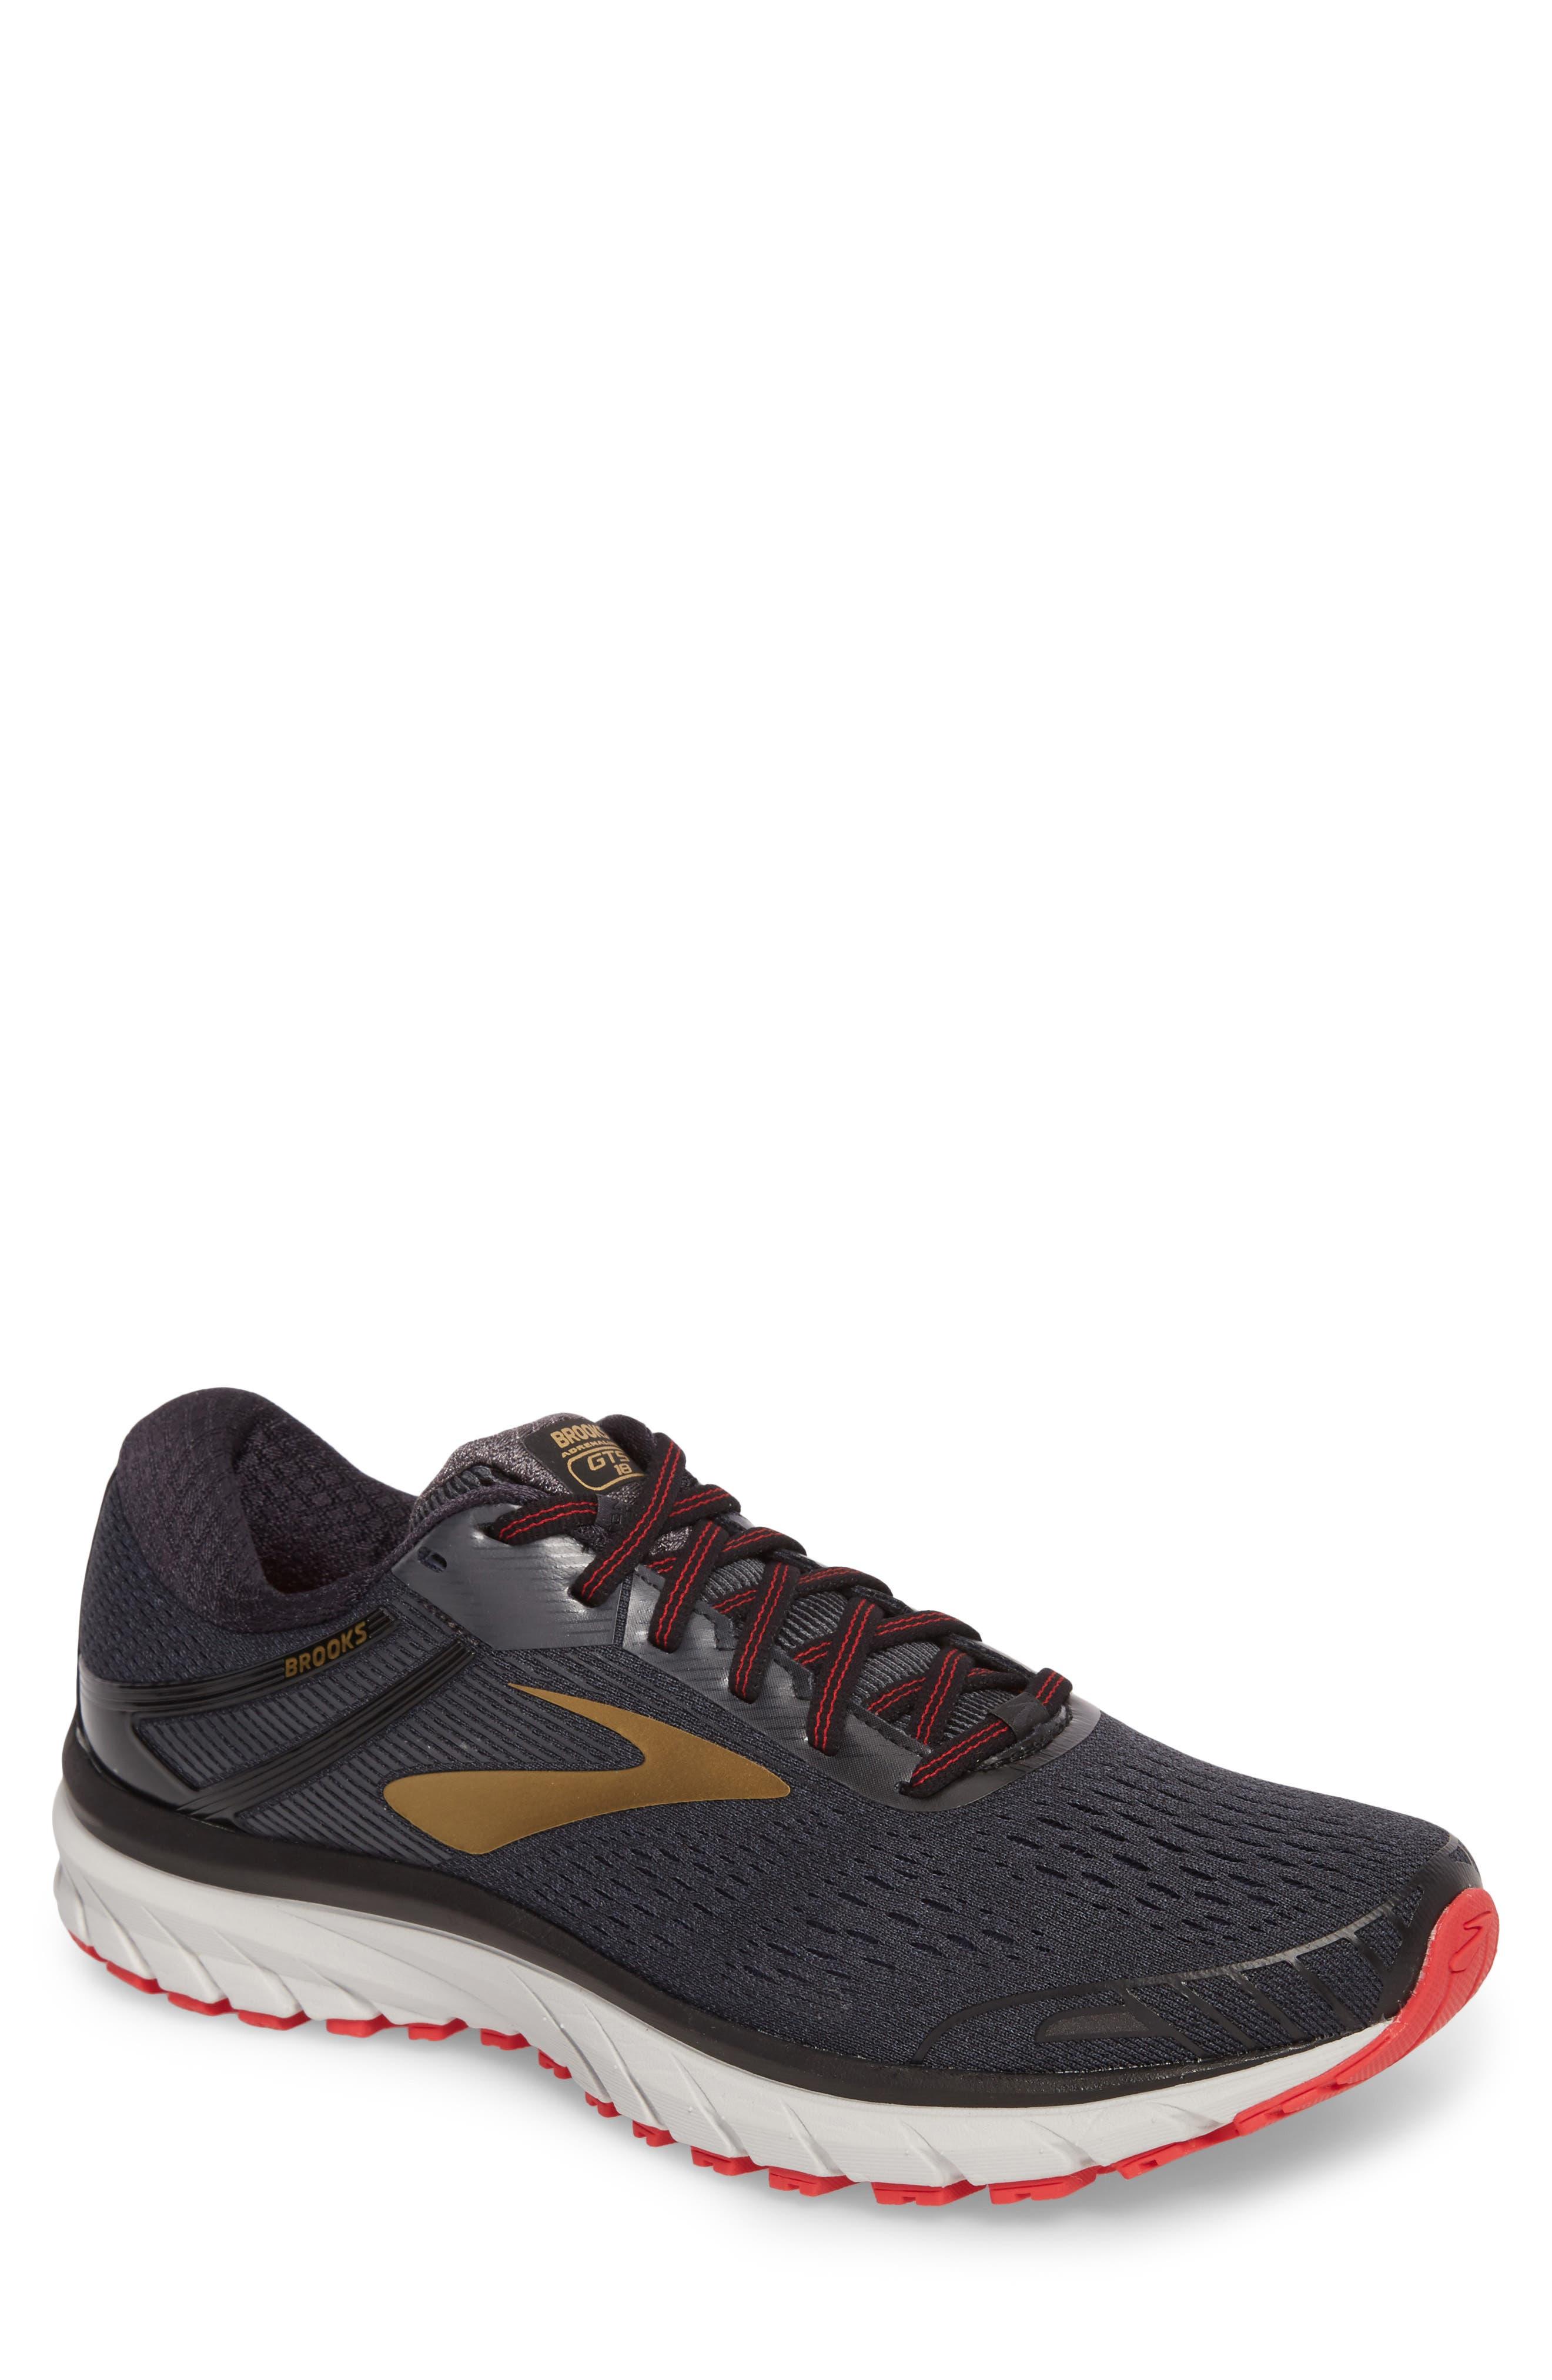 Adrenaline GTS 18 Running Shoe,                             Main thumbnail 1, color,                             BLACK/ GOLD/ RED